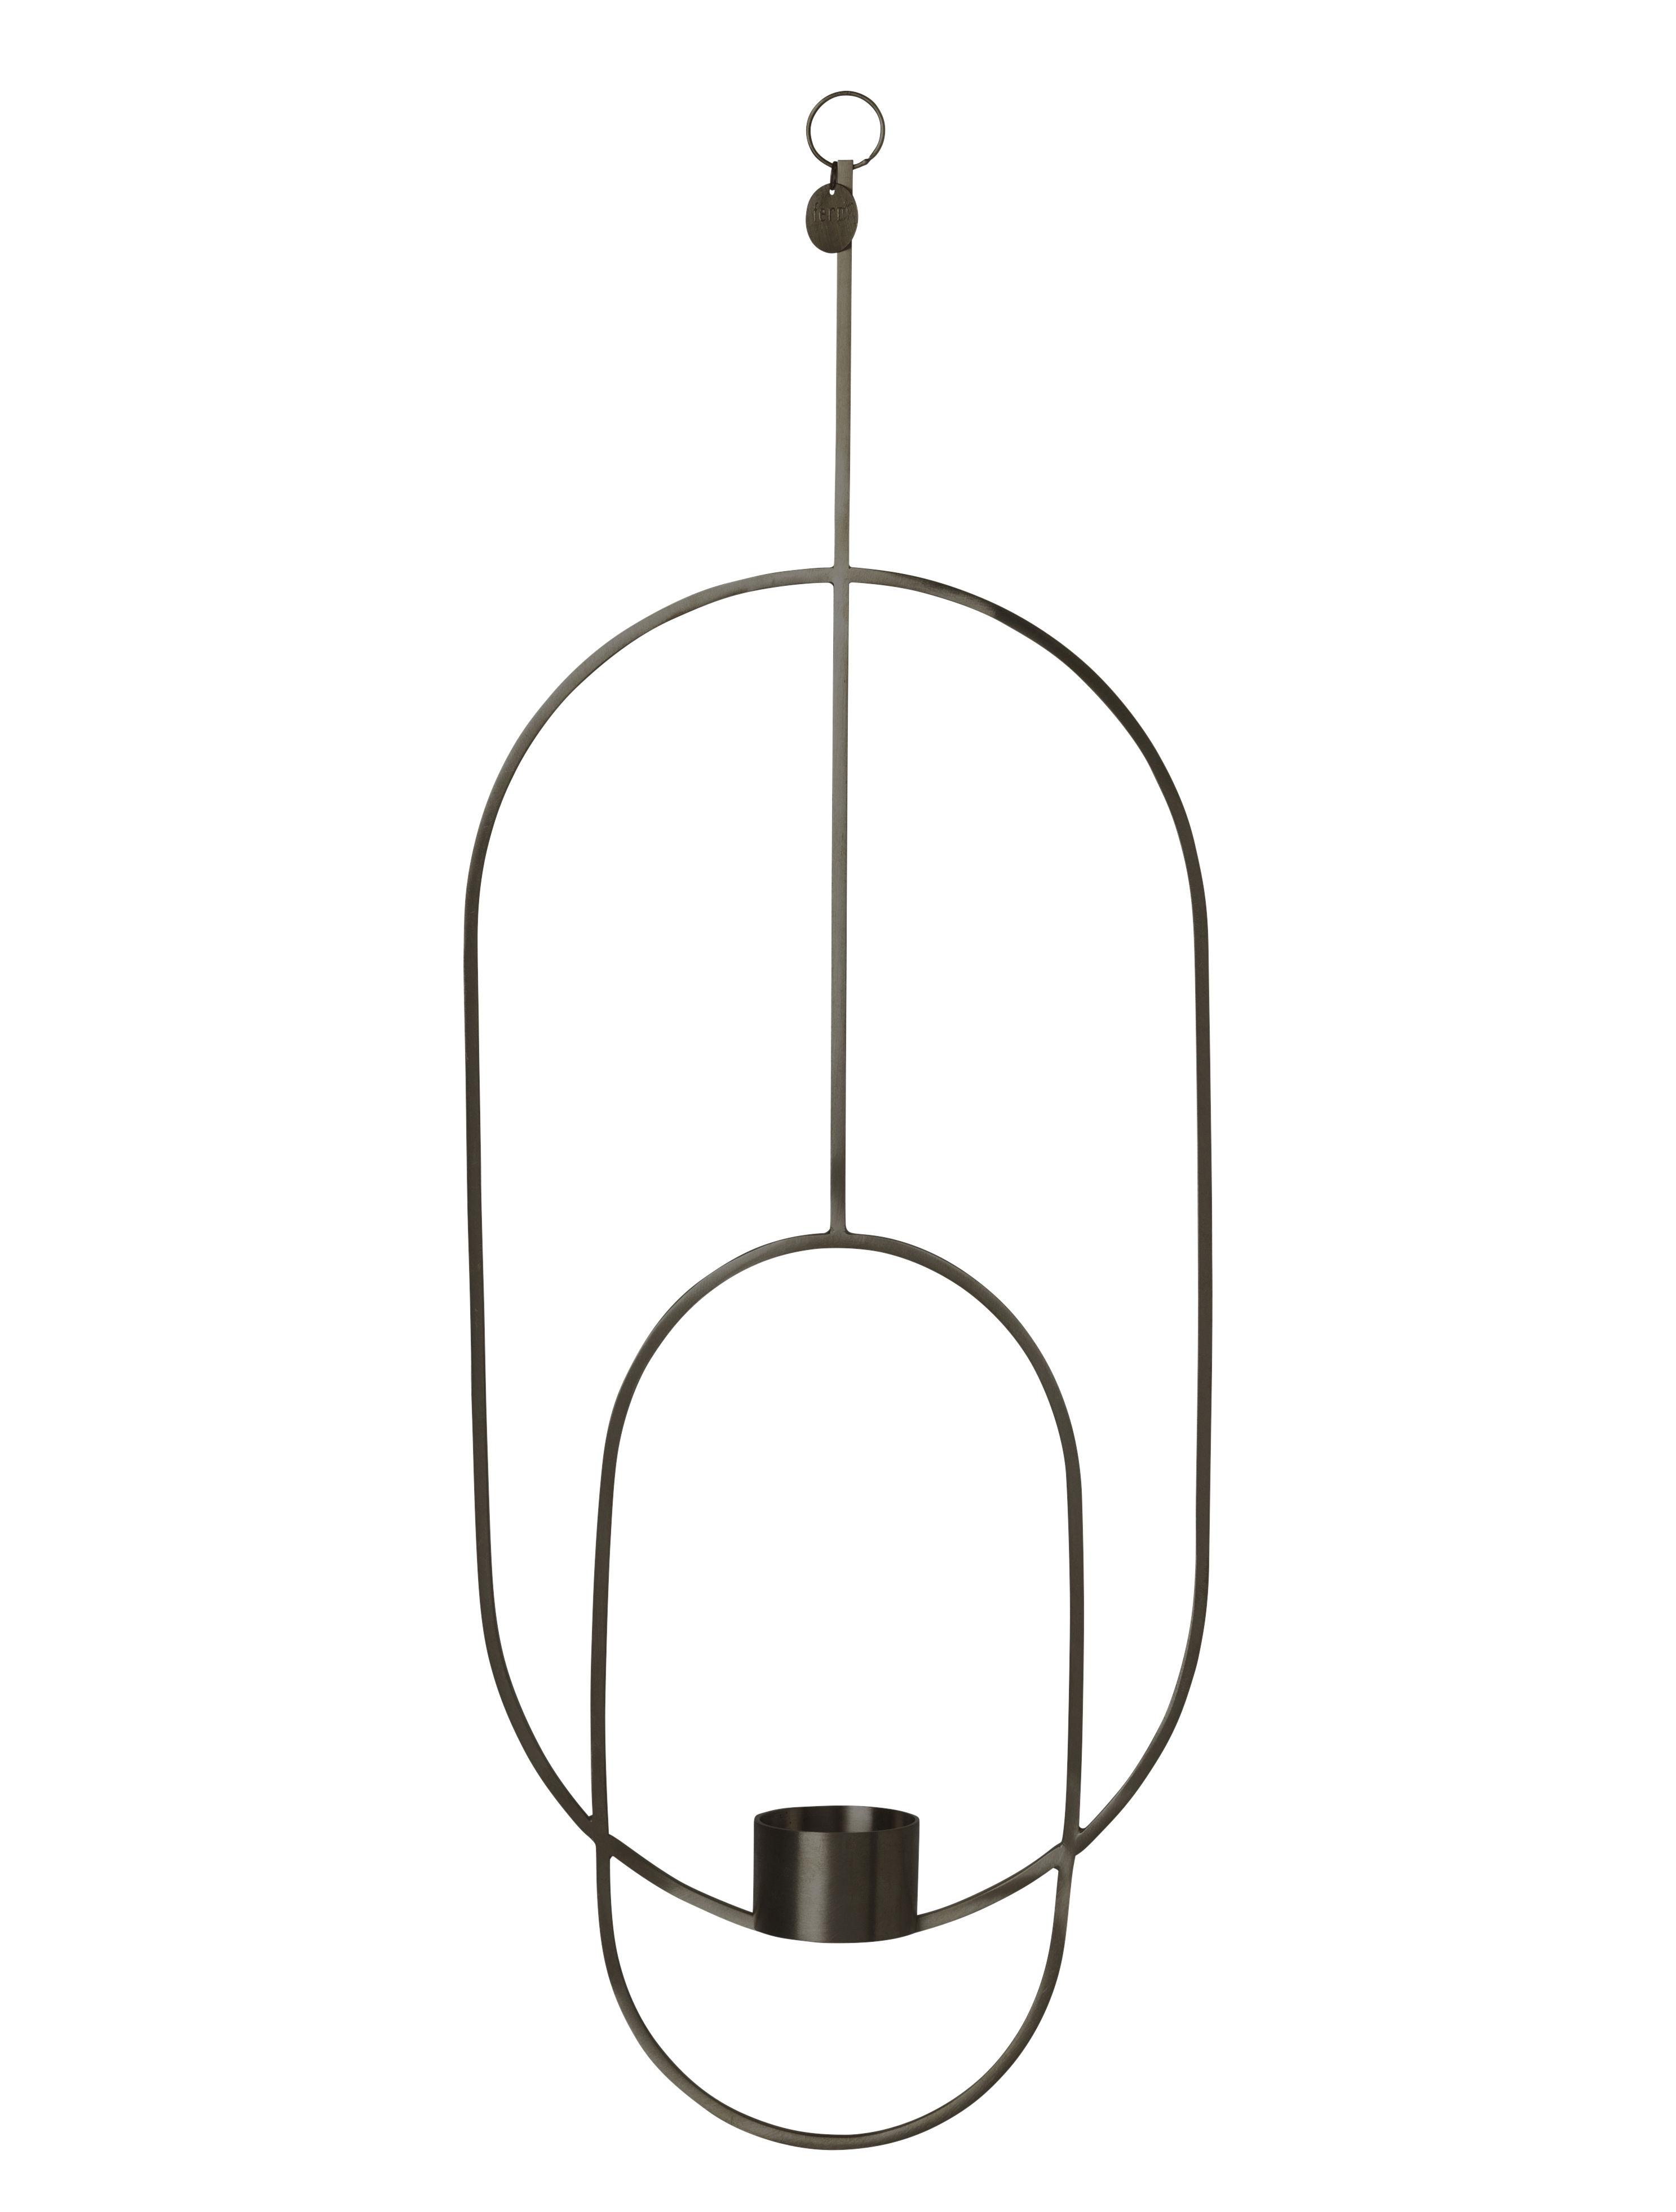 Dekoration - Kerzen, Kerzenleuchter und Windlichter - Oval Kerzenhalter zum Aufhängen / L 18 cm x H 50 cm - Ferm Living - Schwarz - Messing, bemalt